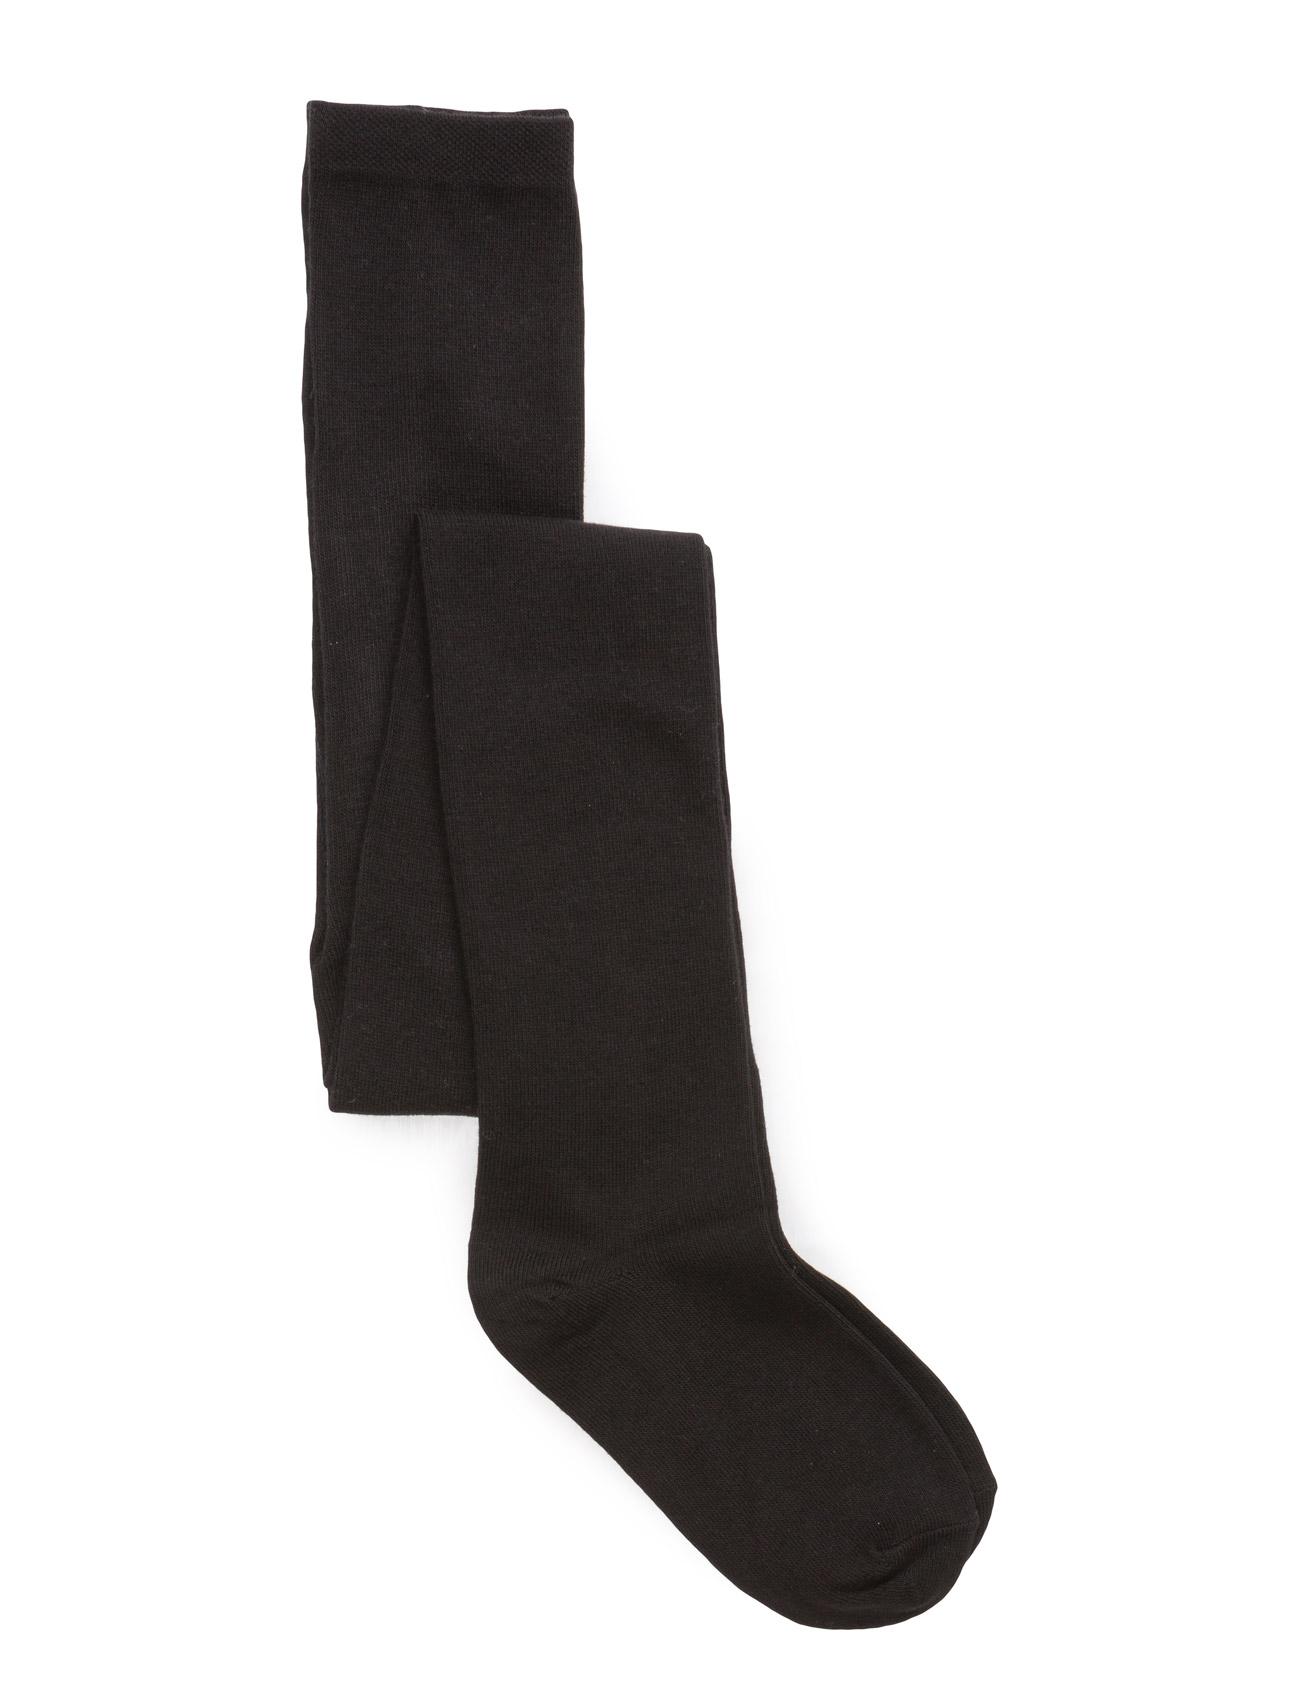 Image of Tight, Plain Colour Girls Socks & Tights Tights Sort MELTON (2382480729)